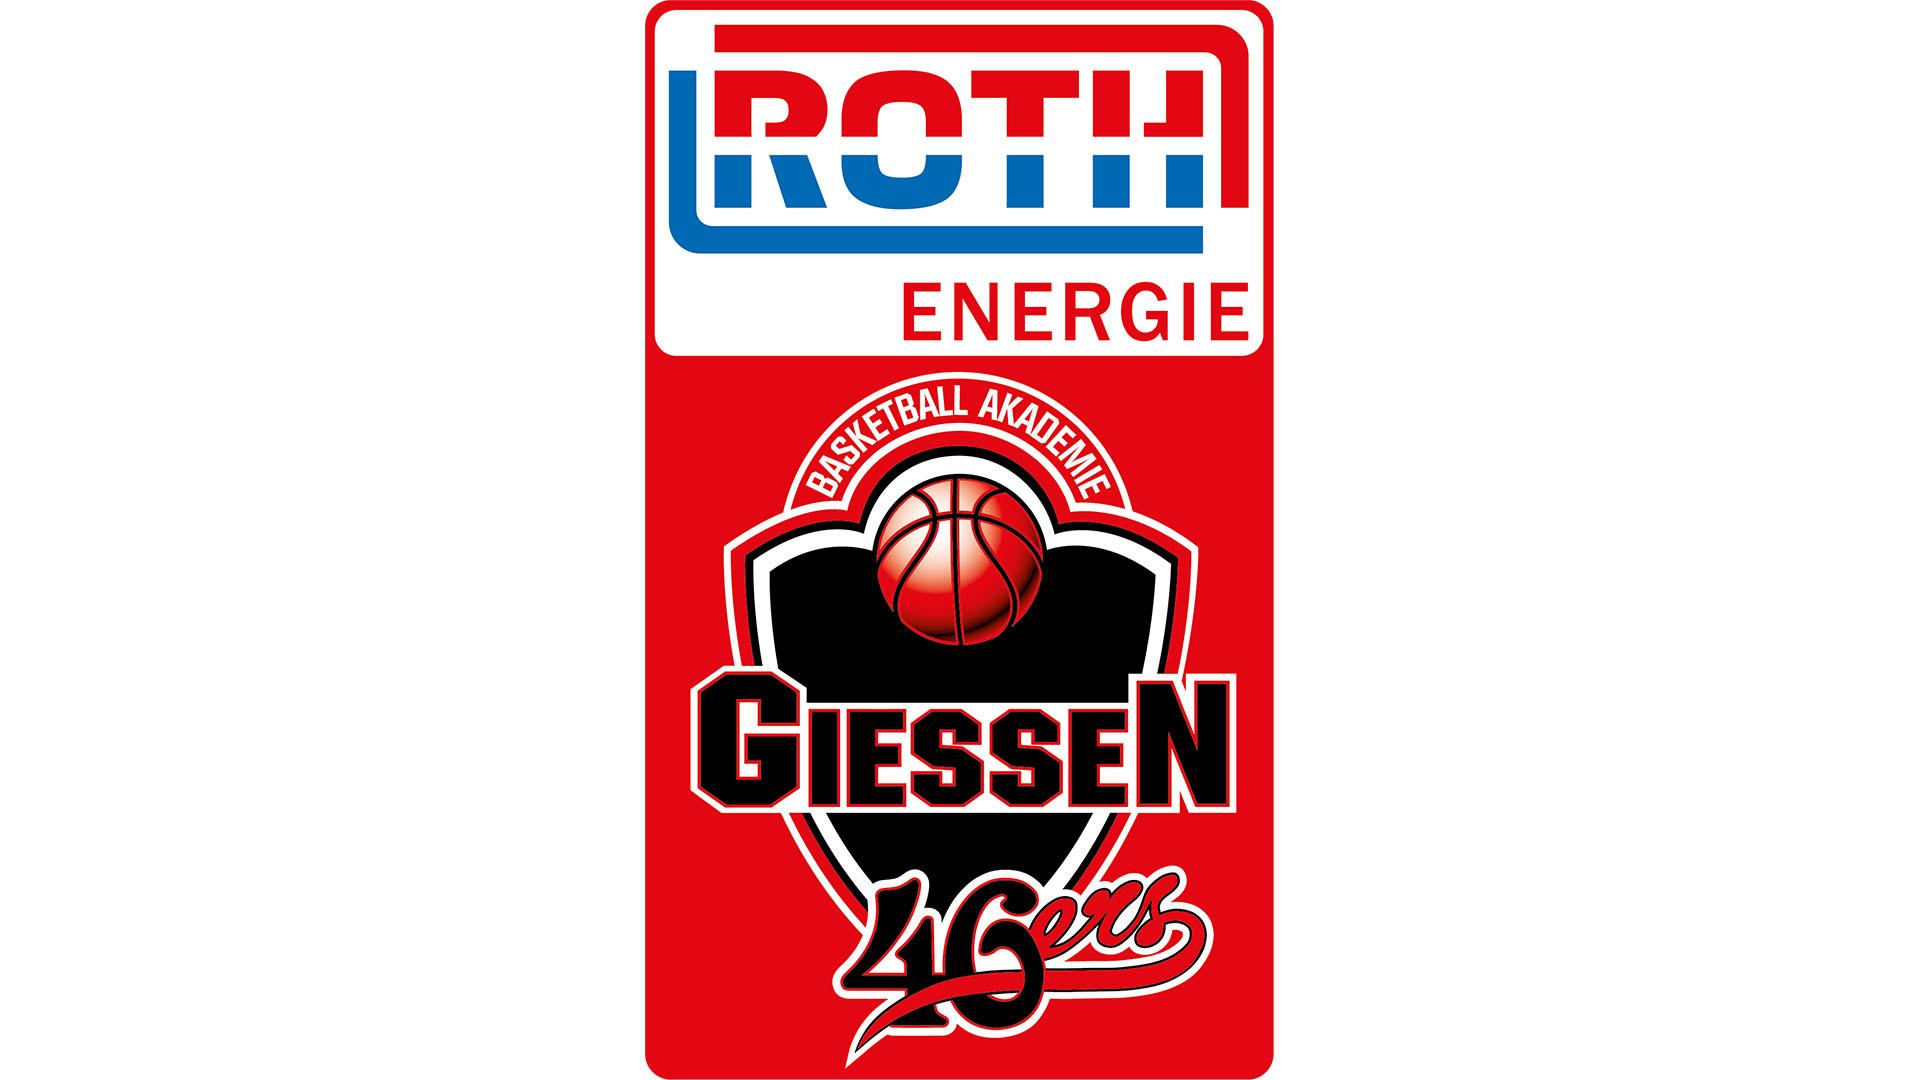 ROTH-Energie-Basketball-Akademie-GIESSEN-46ers_boxlogo_2017_randlos